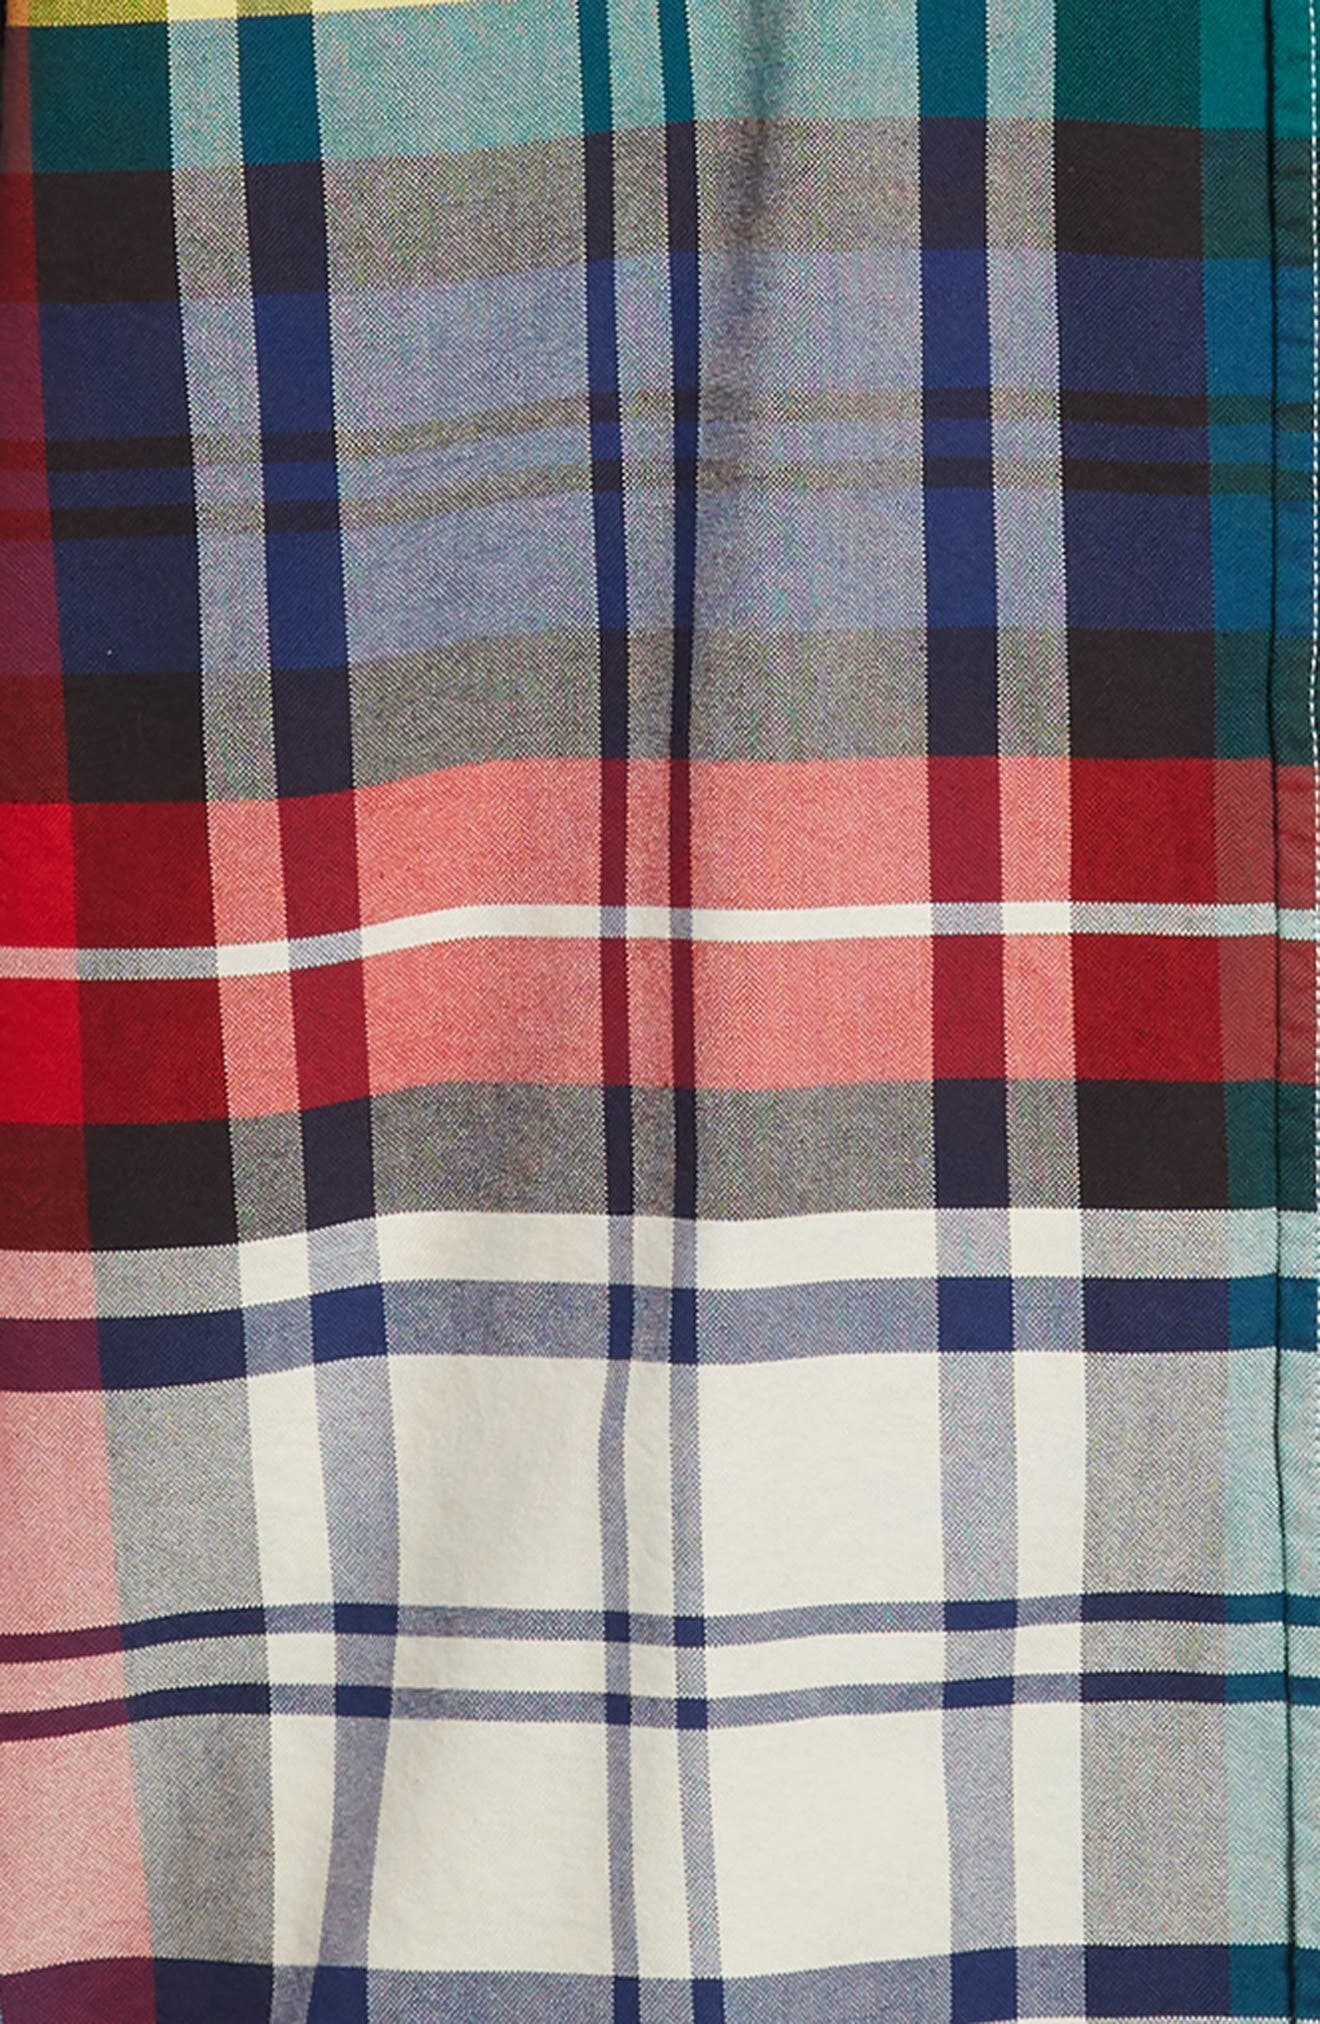 TJM Plaid Crest Sport Shirt,                             Alternate thumbnail 6, color,                             CHECK DARK SAPPHIRE / MULTI